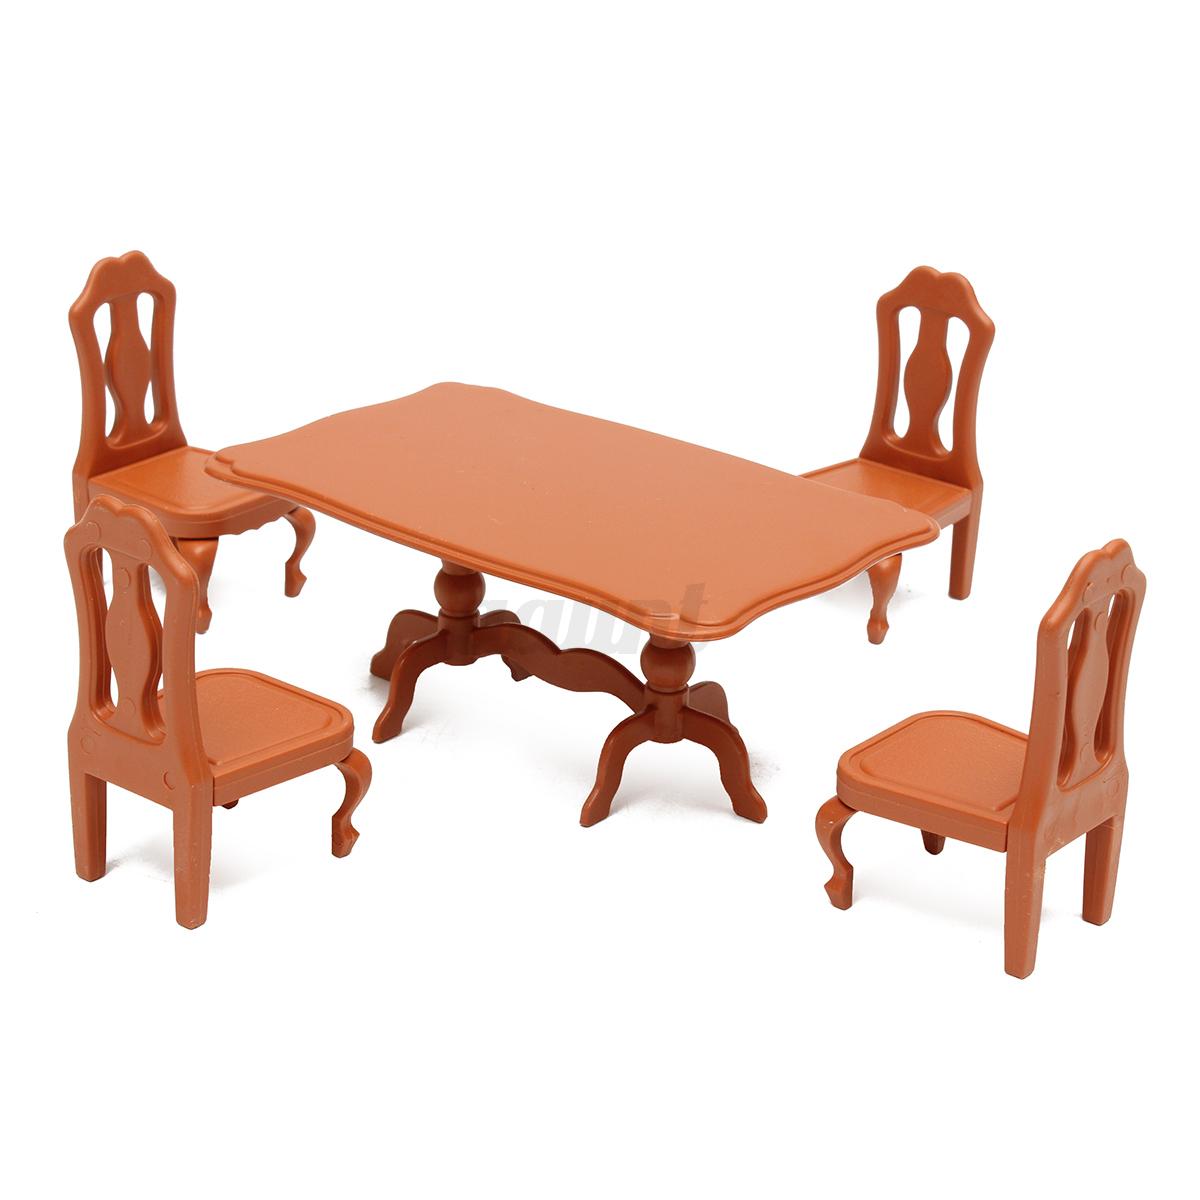 Table Plastic Miniature Doll House Furniture Set Living Room Kitchen Decoration